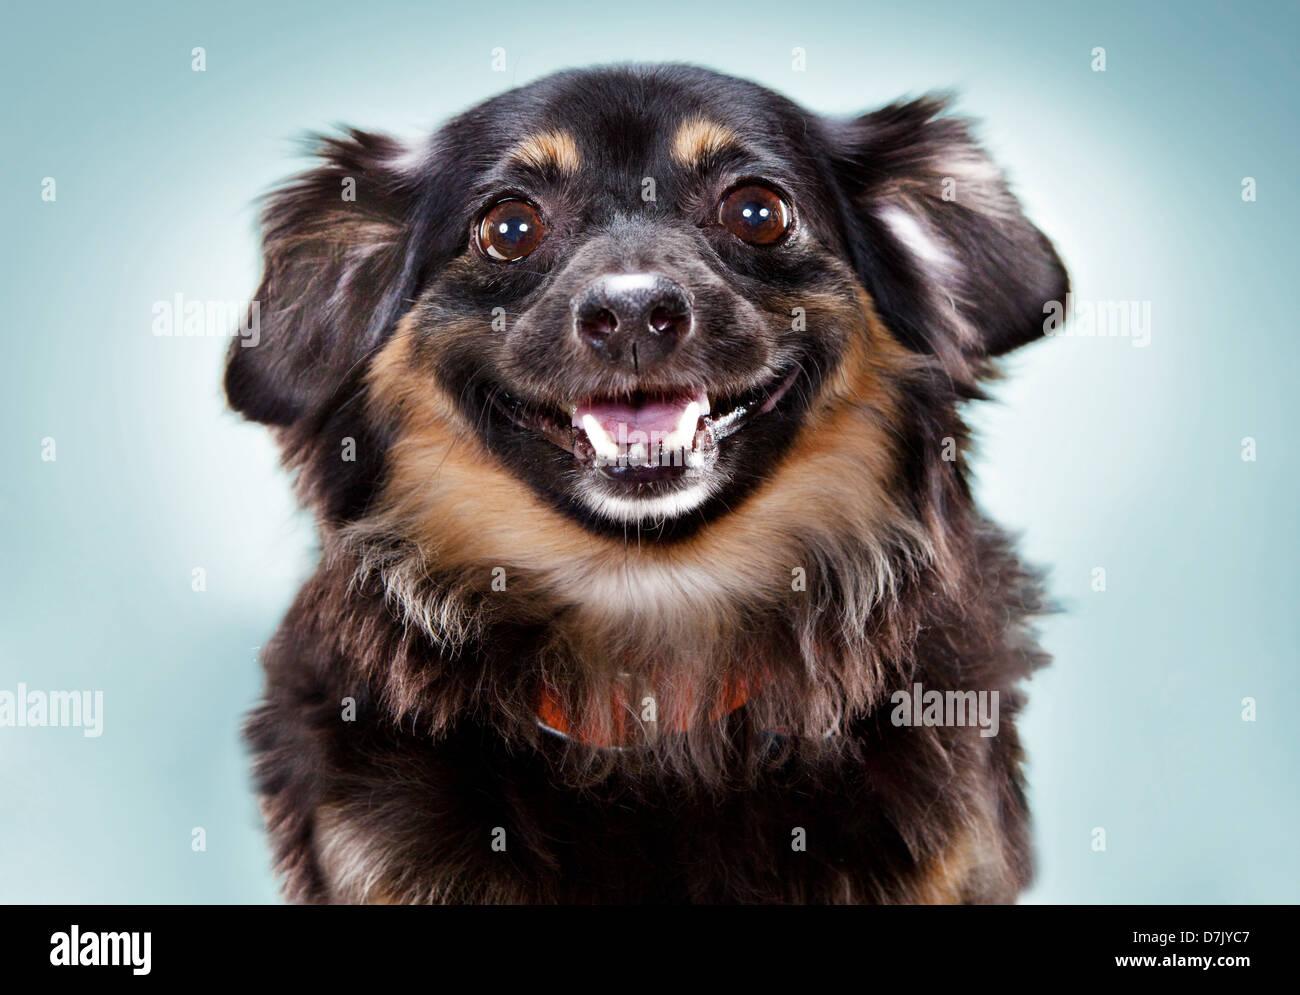 Pics photos dachshund chihuahua dog mix dogs pictures photos pics - Stock Photo Dachshund Chihuahua Mix Breed Dog Gazing To Camera